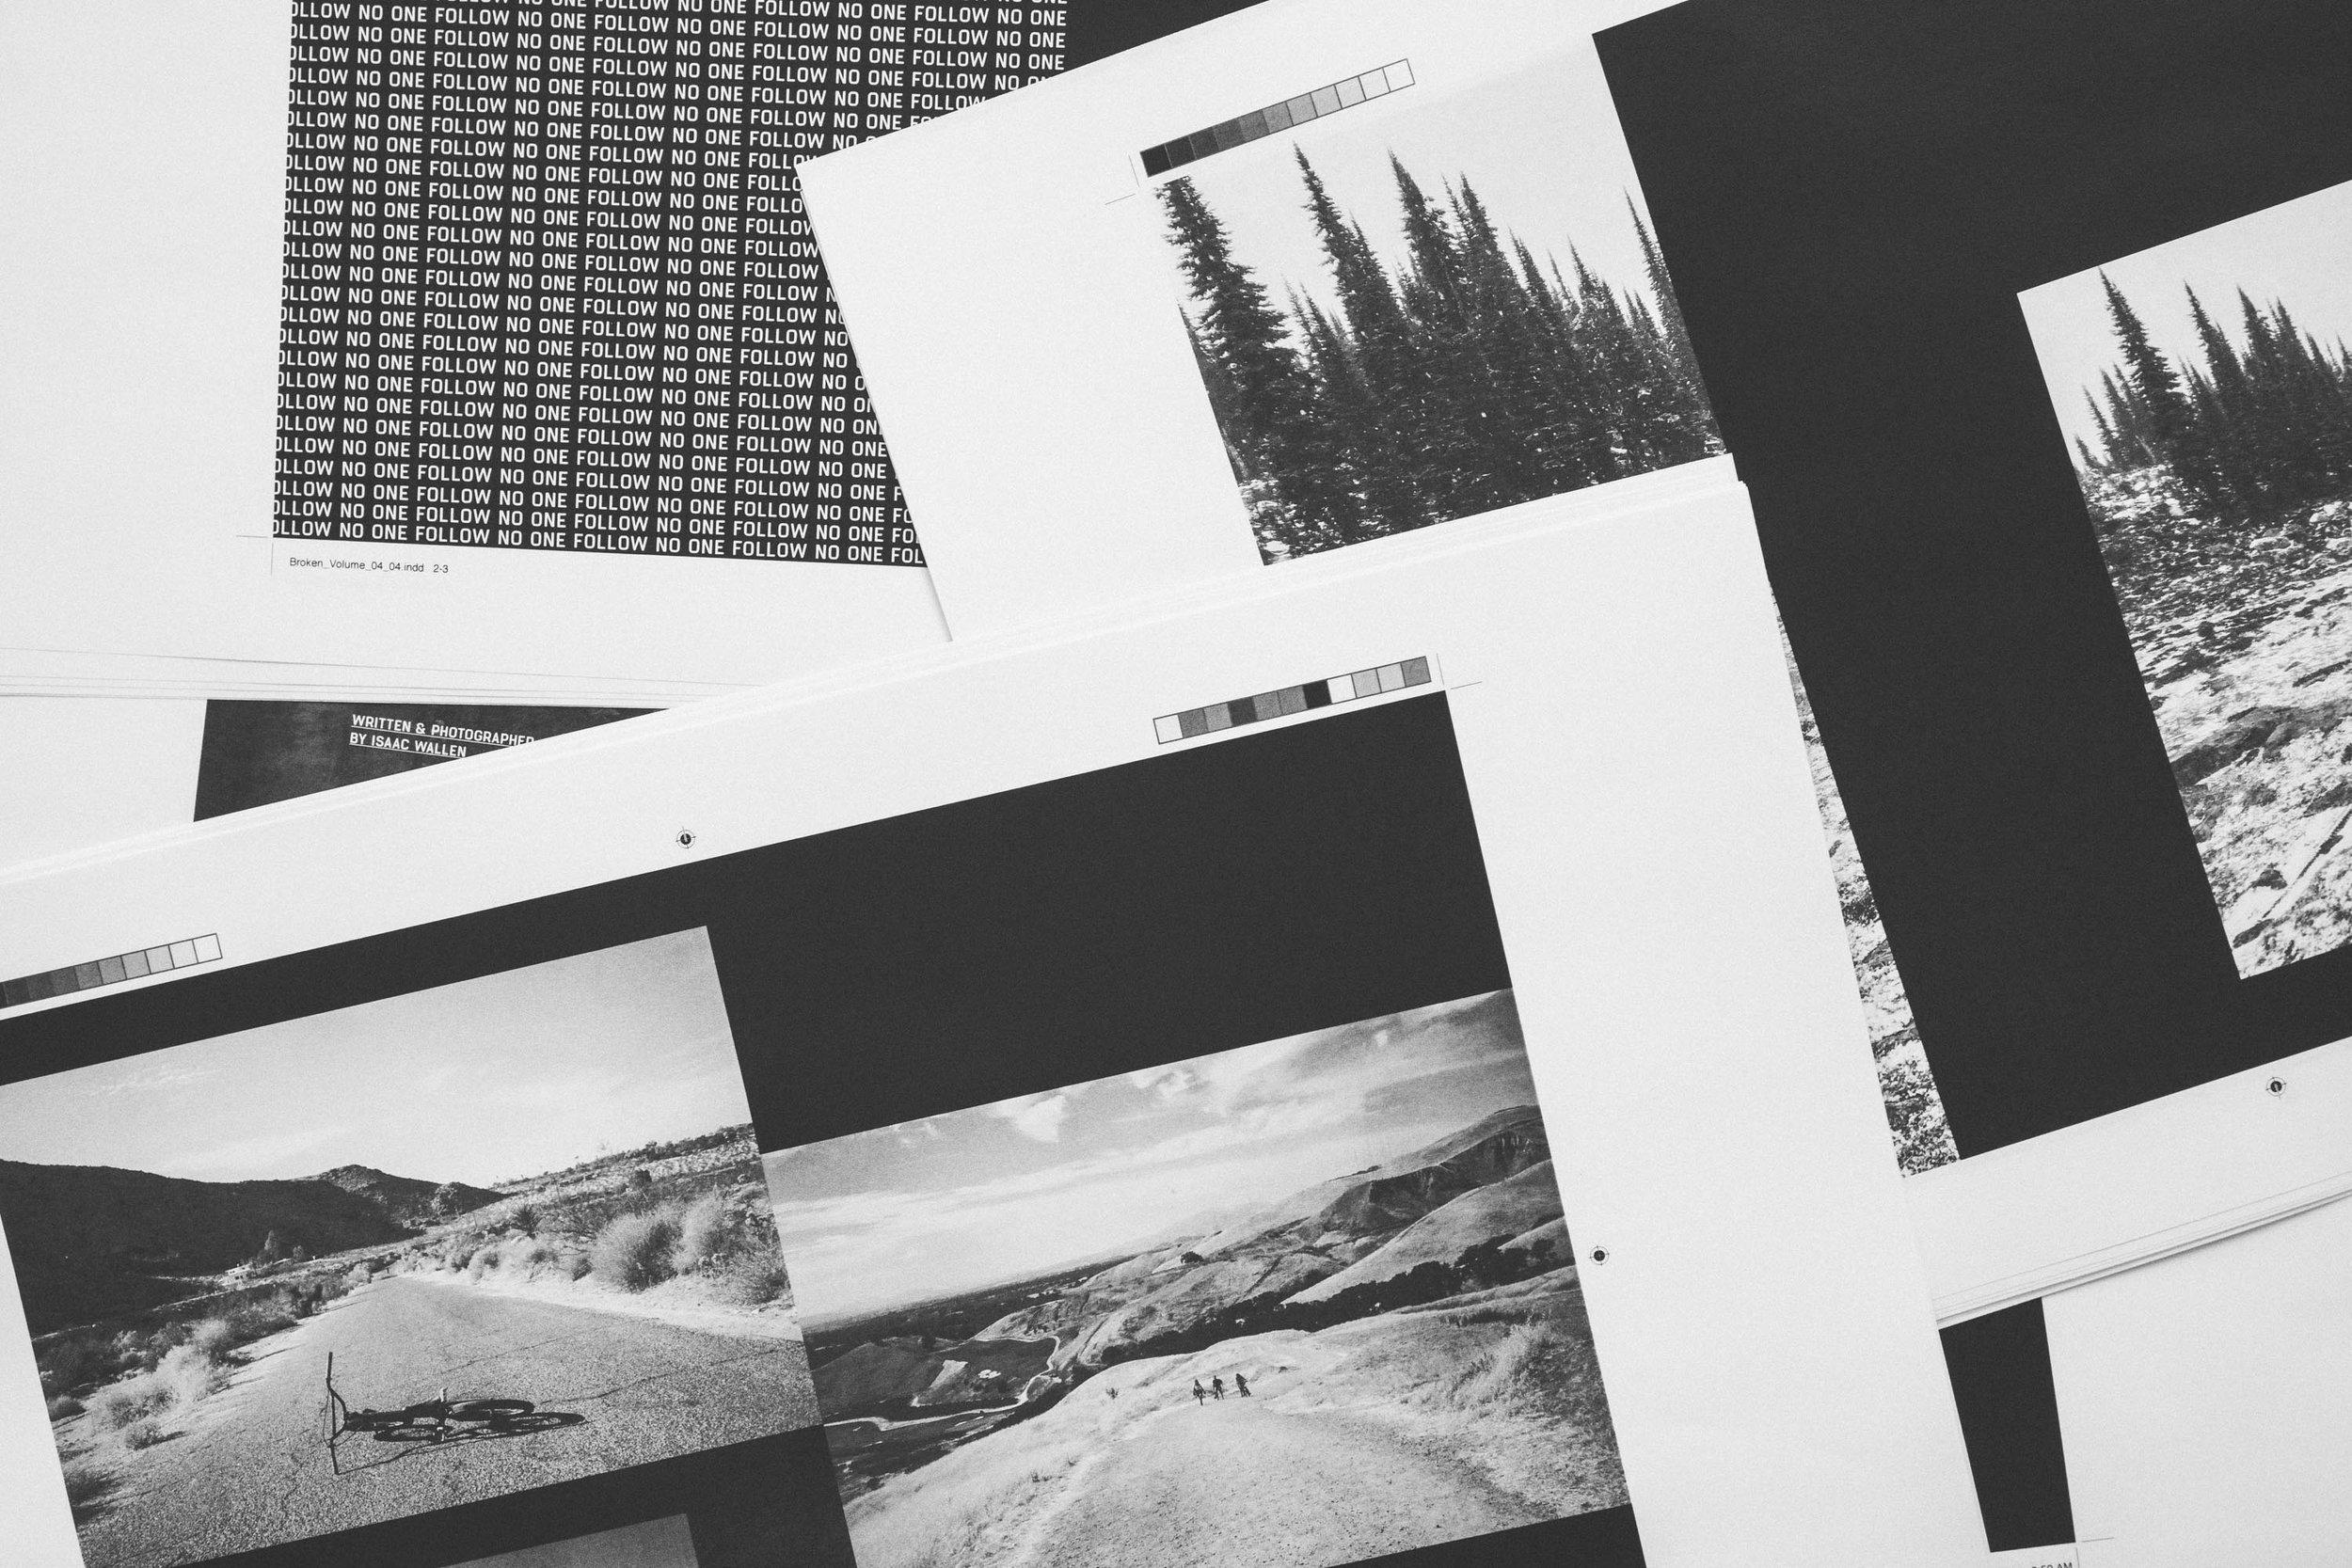 Broken_Printout_1.jpg